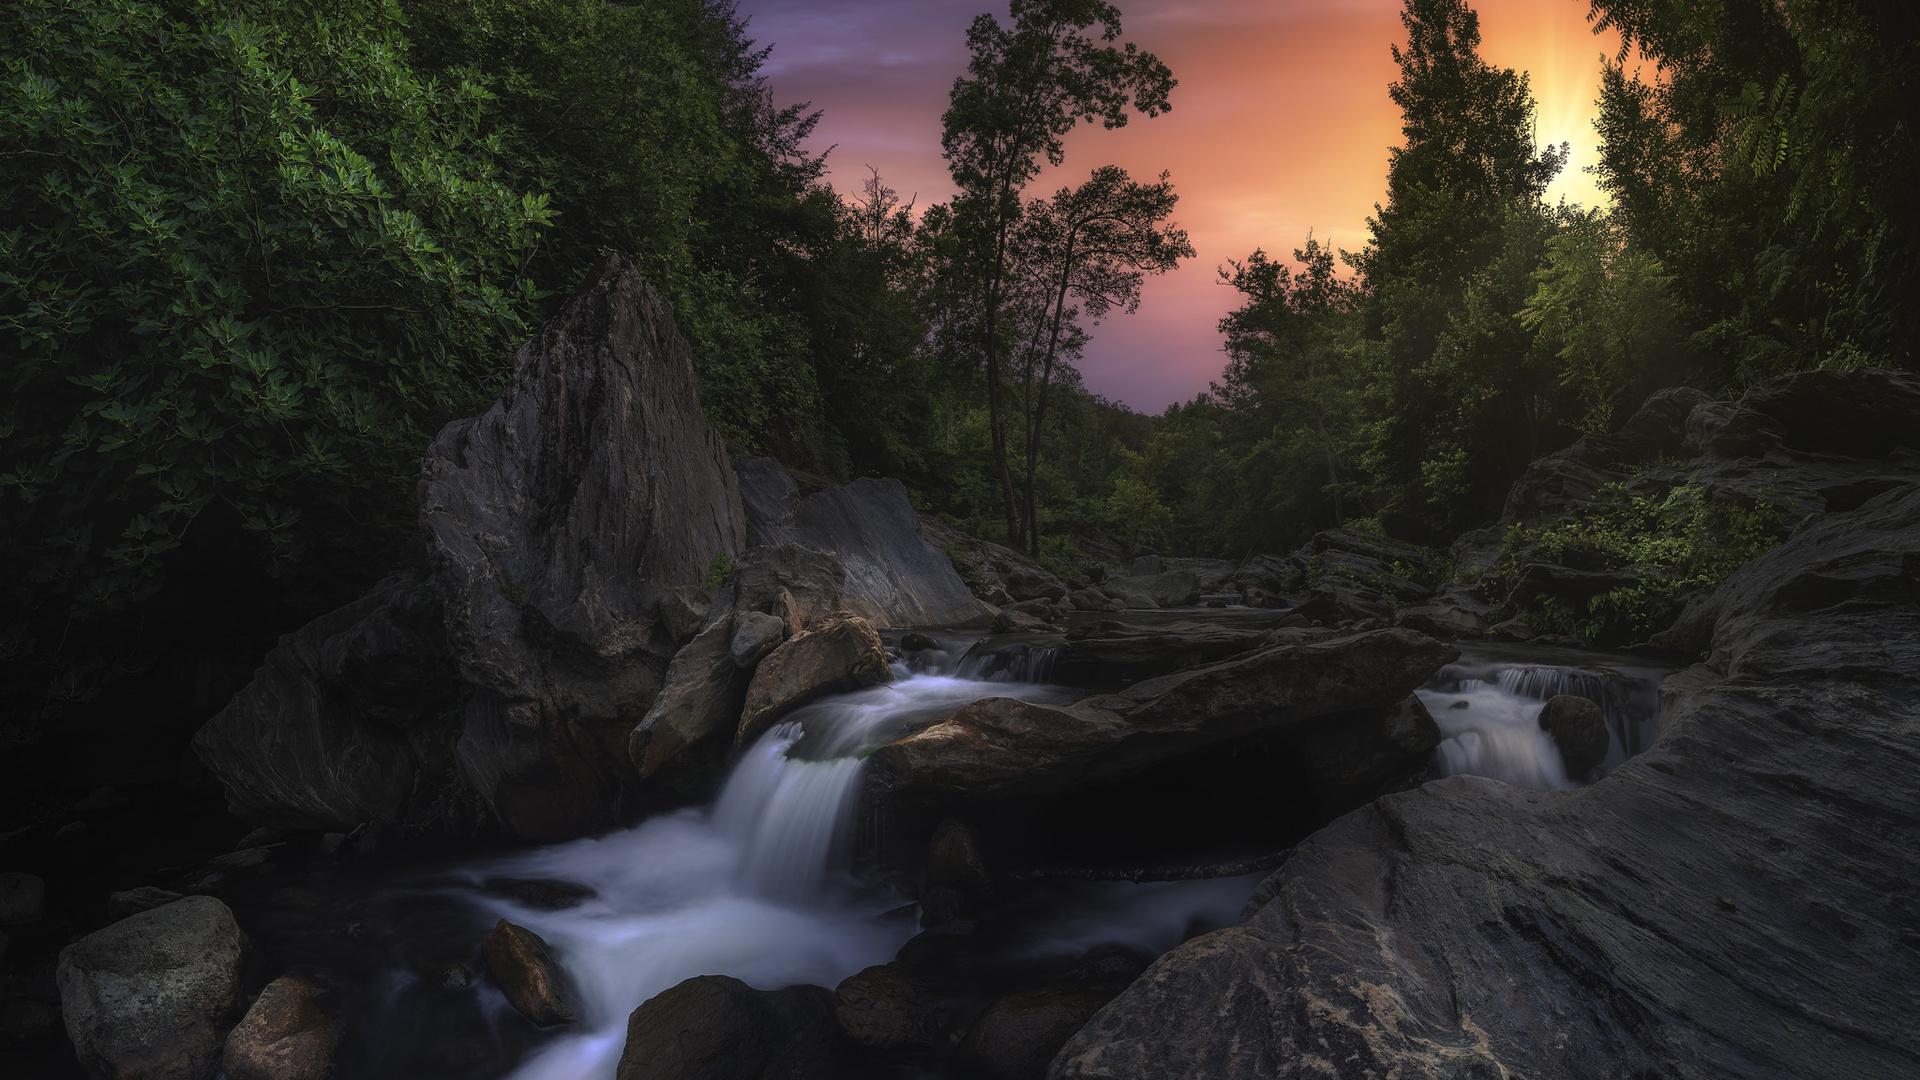 corsica, корсика, природа, пейзаж, камни, река, деревья, течение